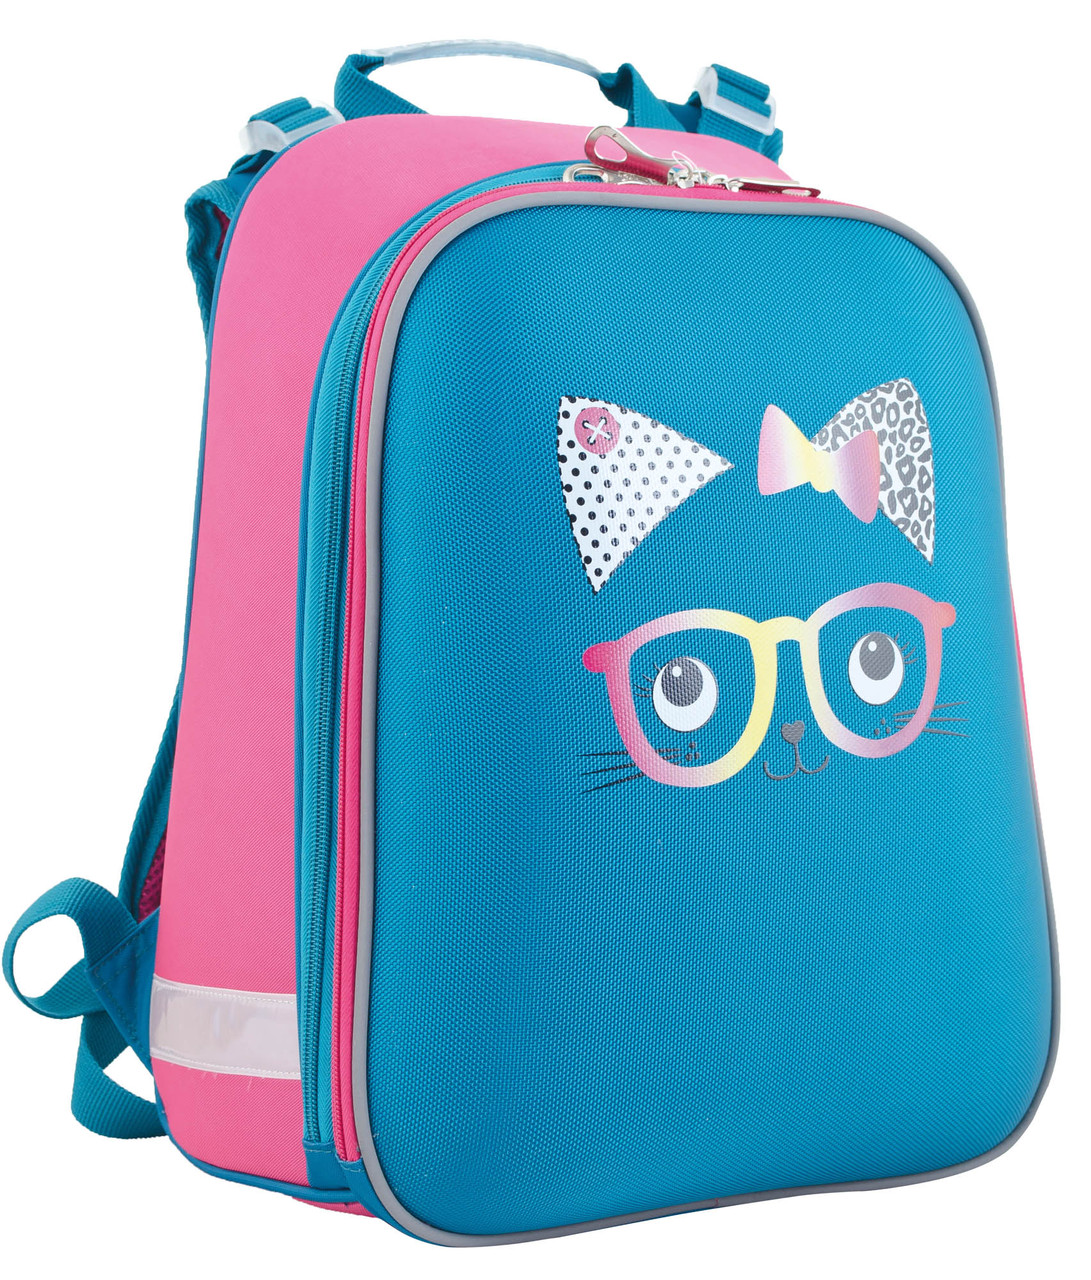 Рюкзак каркасный  H-12 Meow, 38*29*15, фото 1